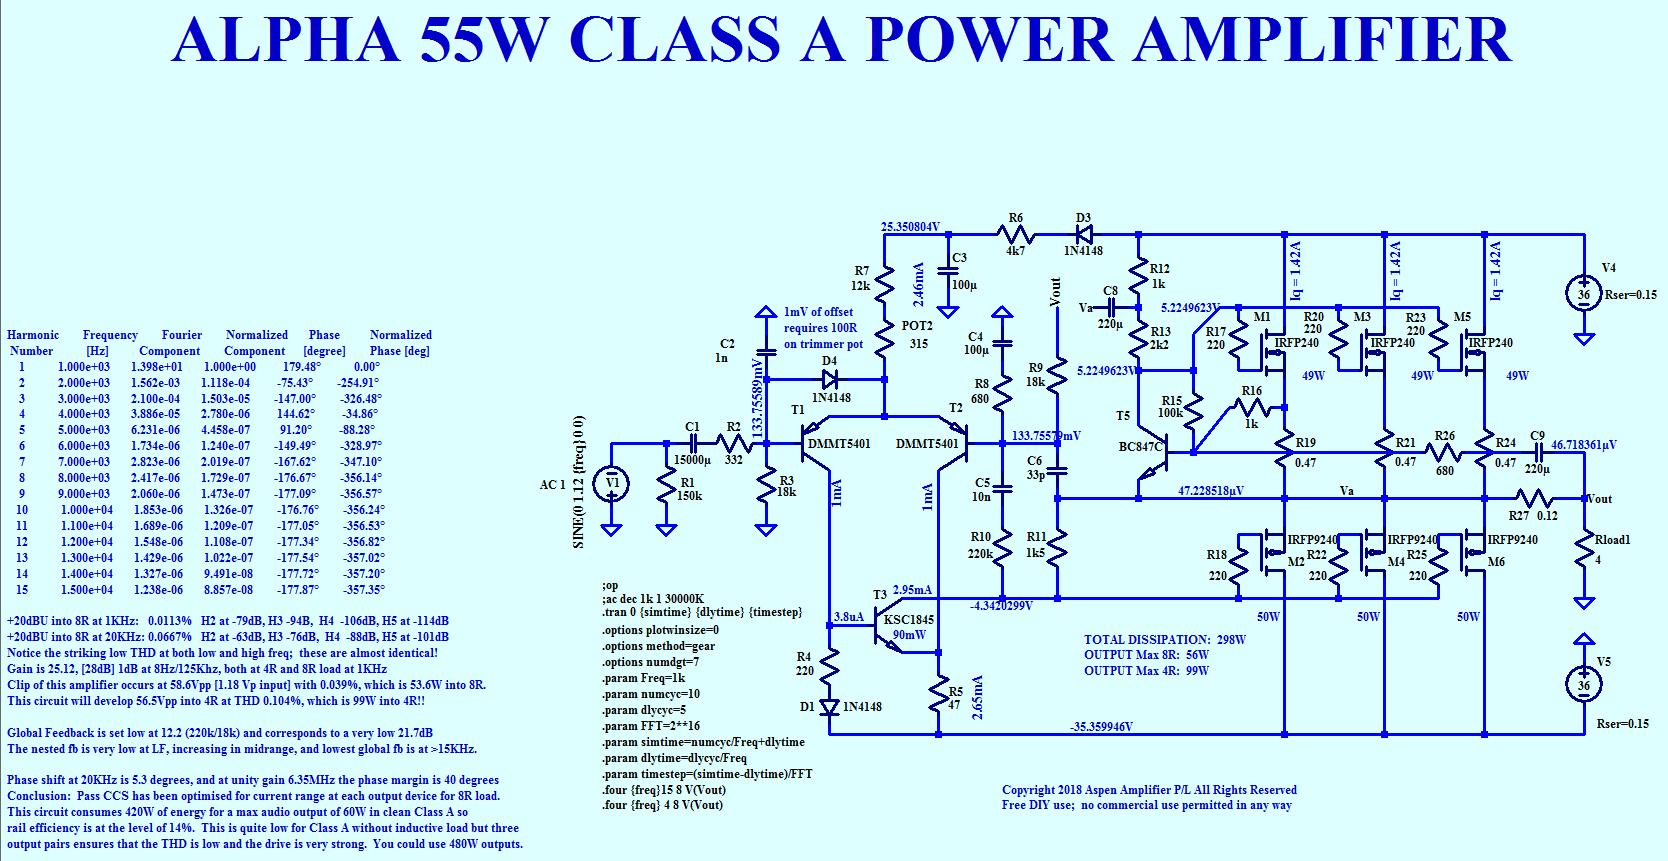 Aksa Lender P-mos Hybrid Aleph (ALPHA) Amplifier-alpha-55w-pchan-schematic-png